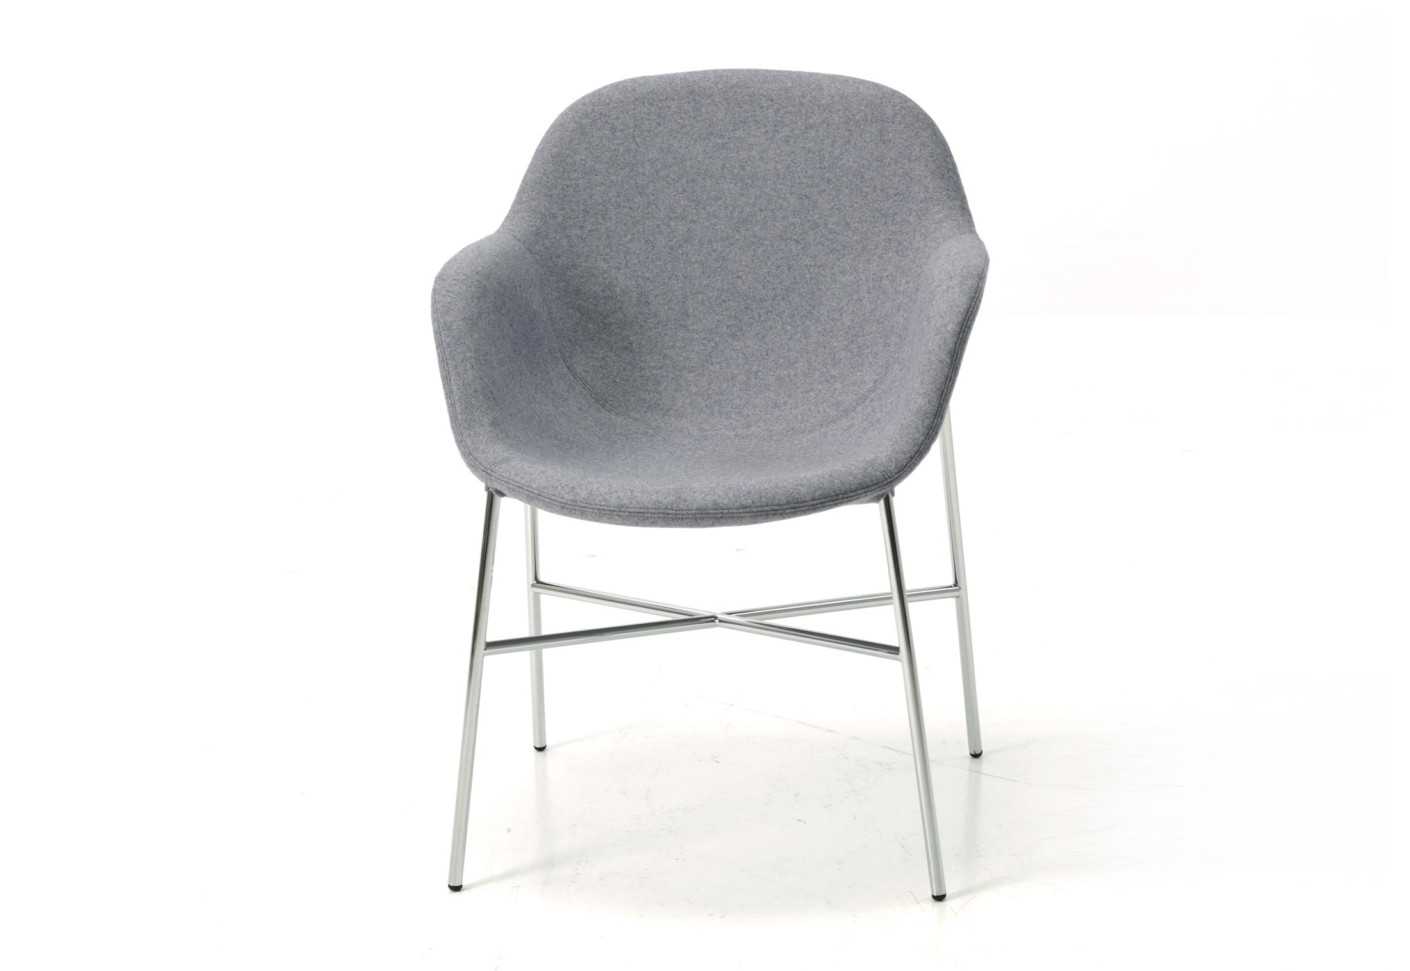 Tia Maria Arm chair small by Moroso